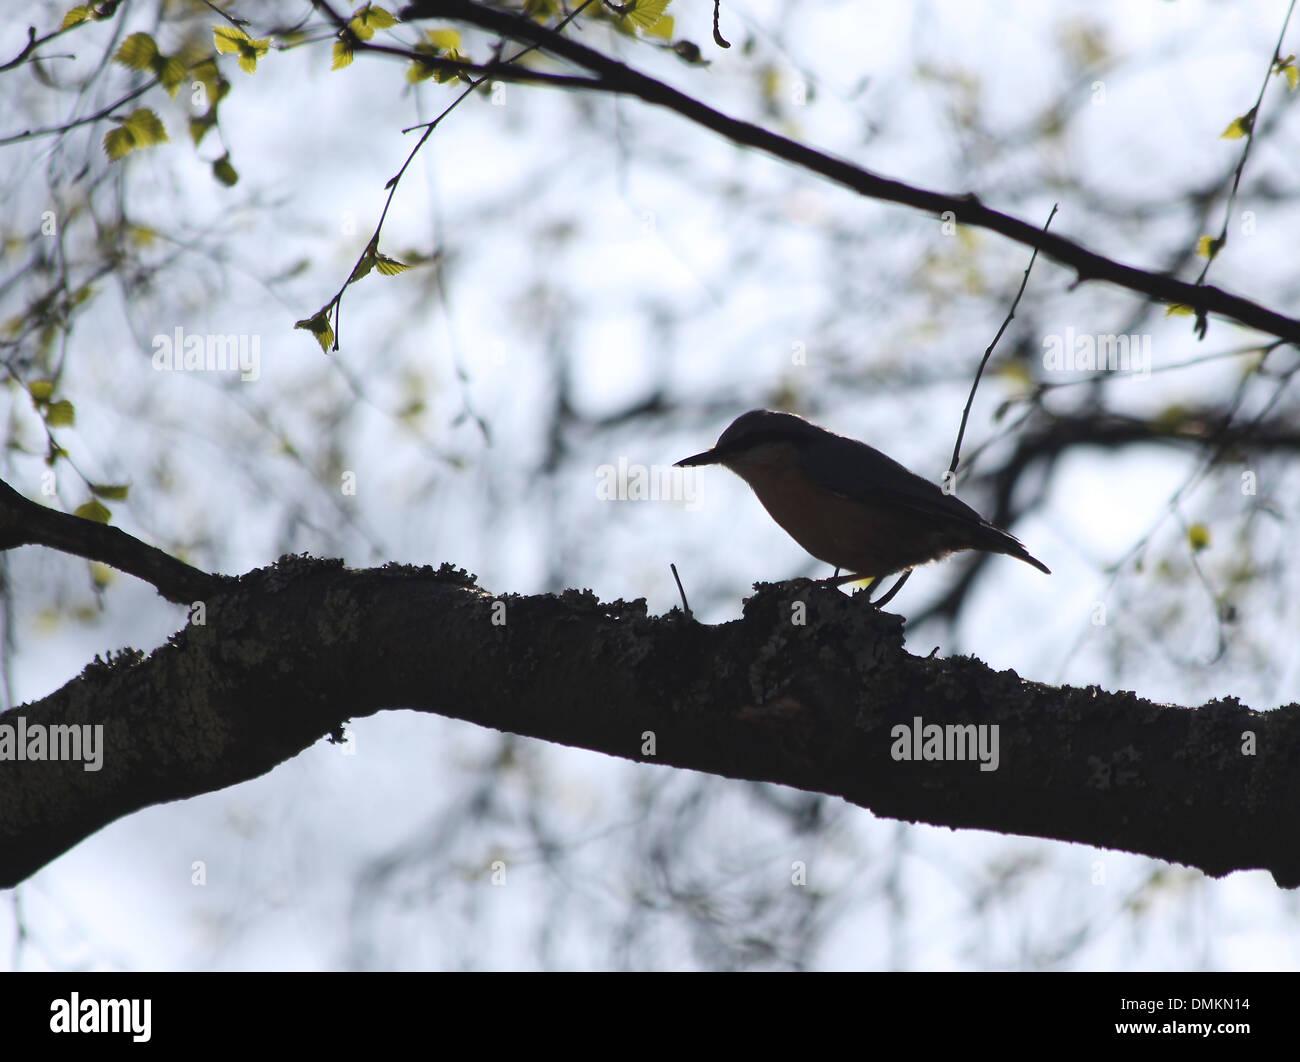 Small Mockingbird (nuthatch) sitting on a branch Stock Photo